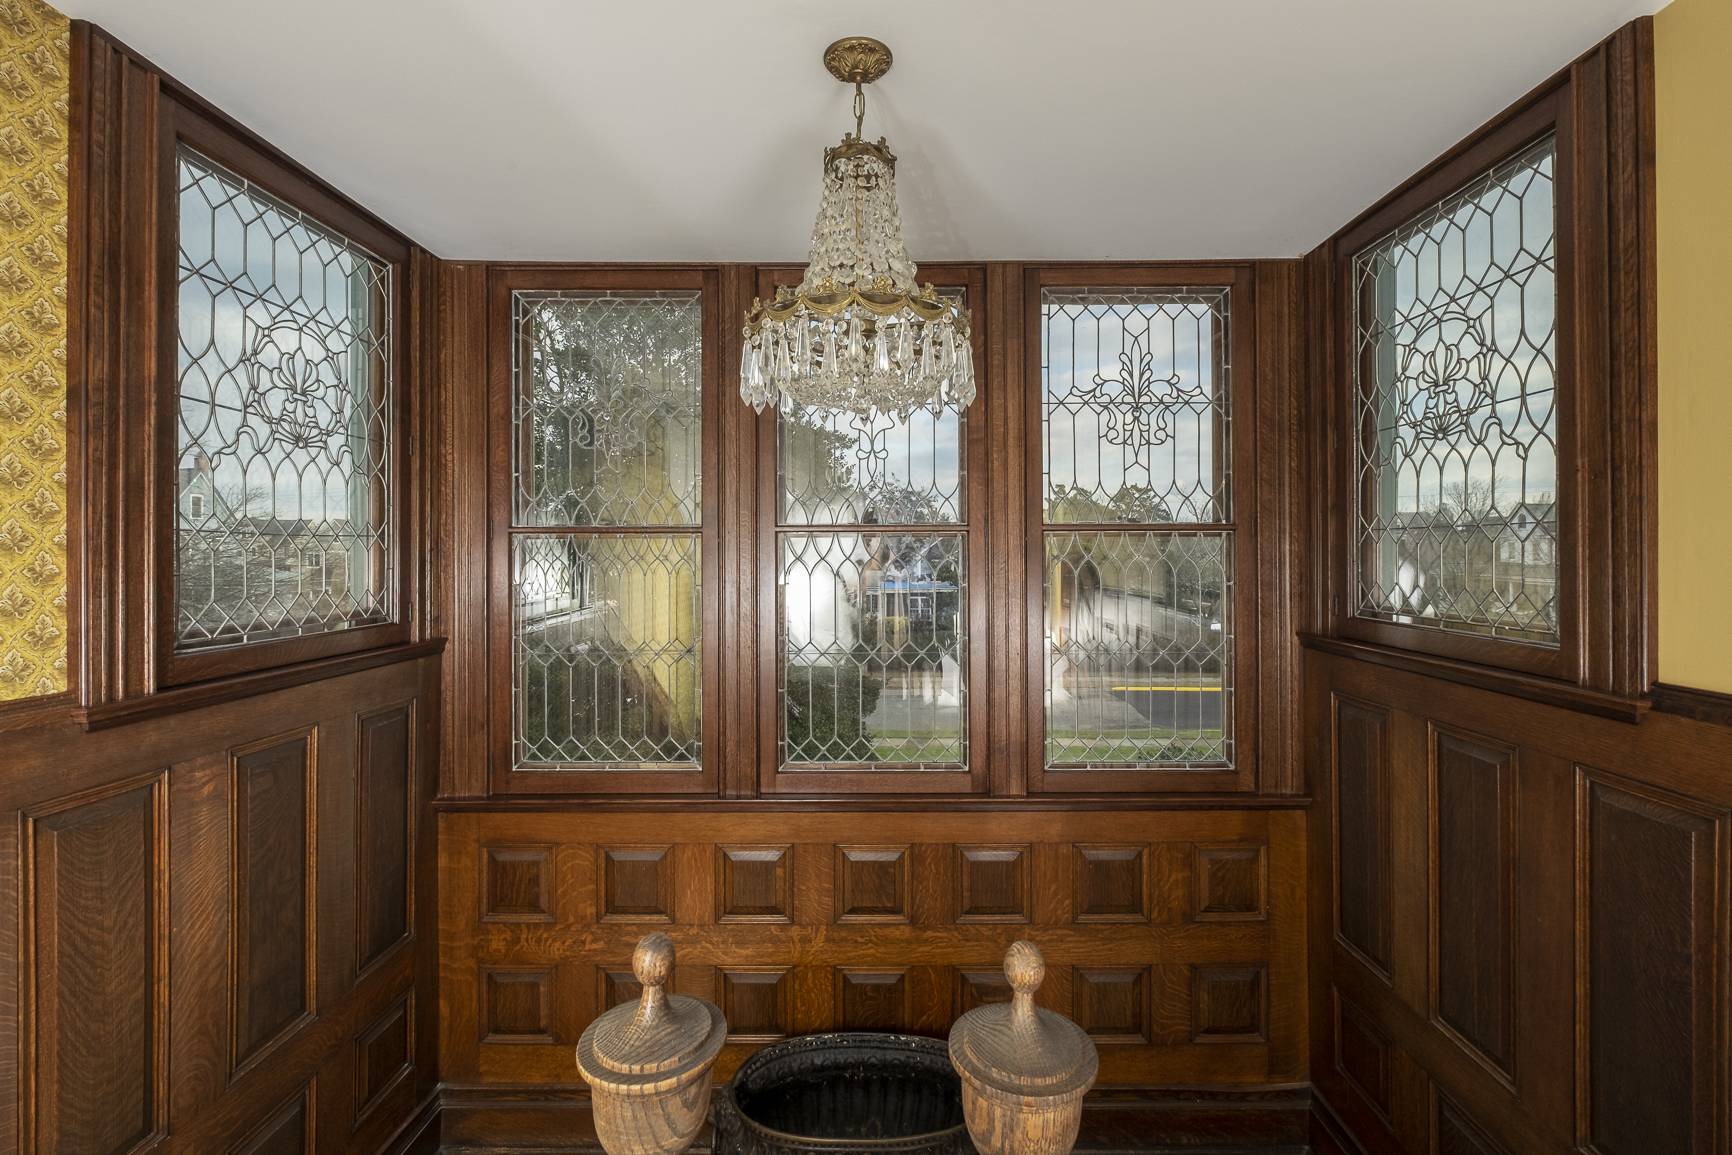 Restored Leaded Glass Windows